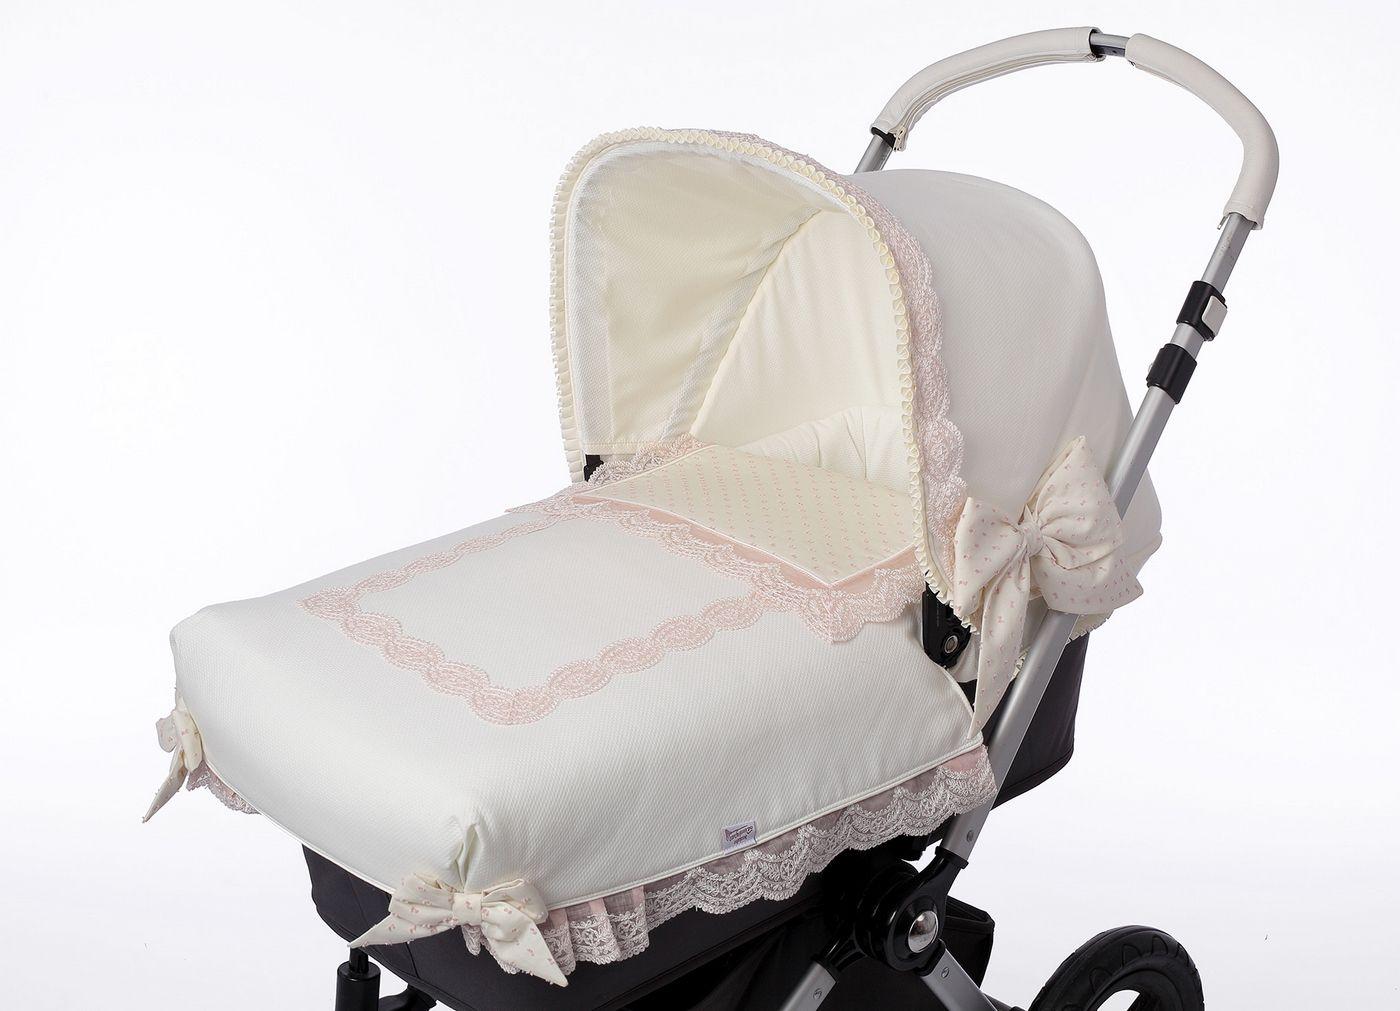 Vestiduras de Carro Bebé a Medida Nanetes en 2020 | Carros